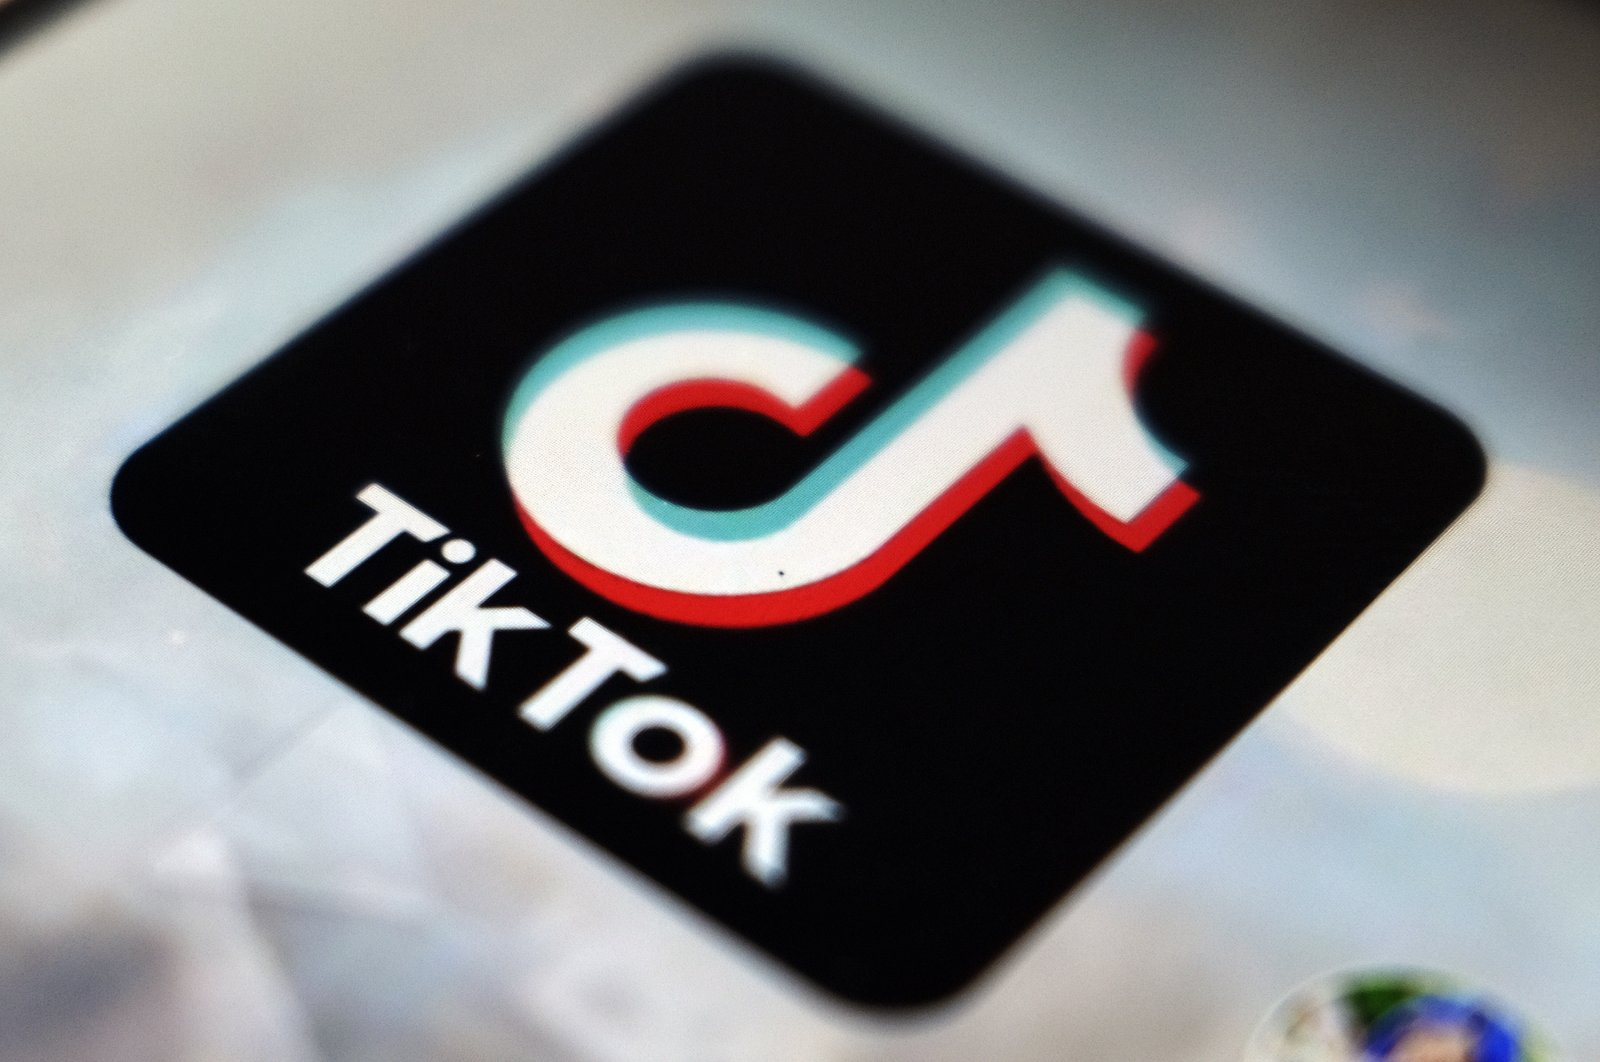 A view of the TikTok app logo, Tokyo, Japan, Sept. 28, 2020. (AP Photo)